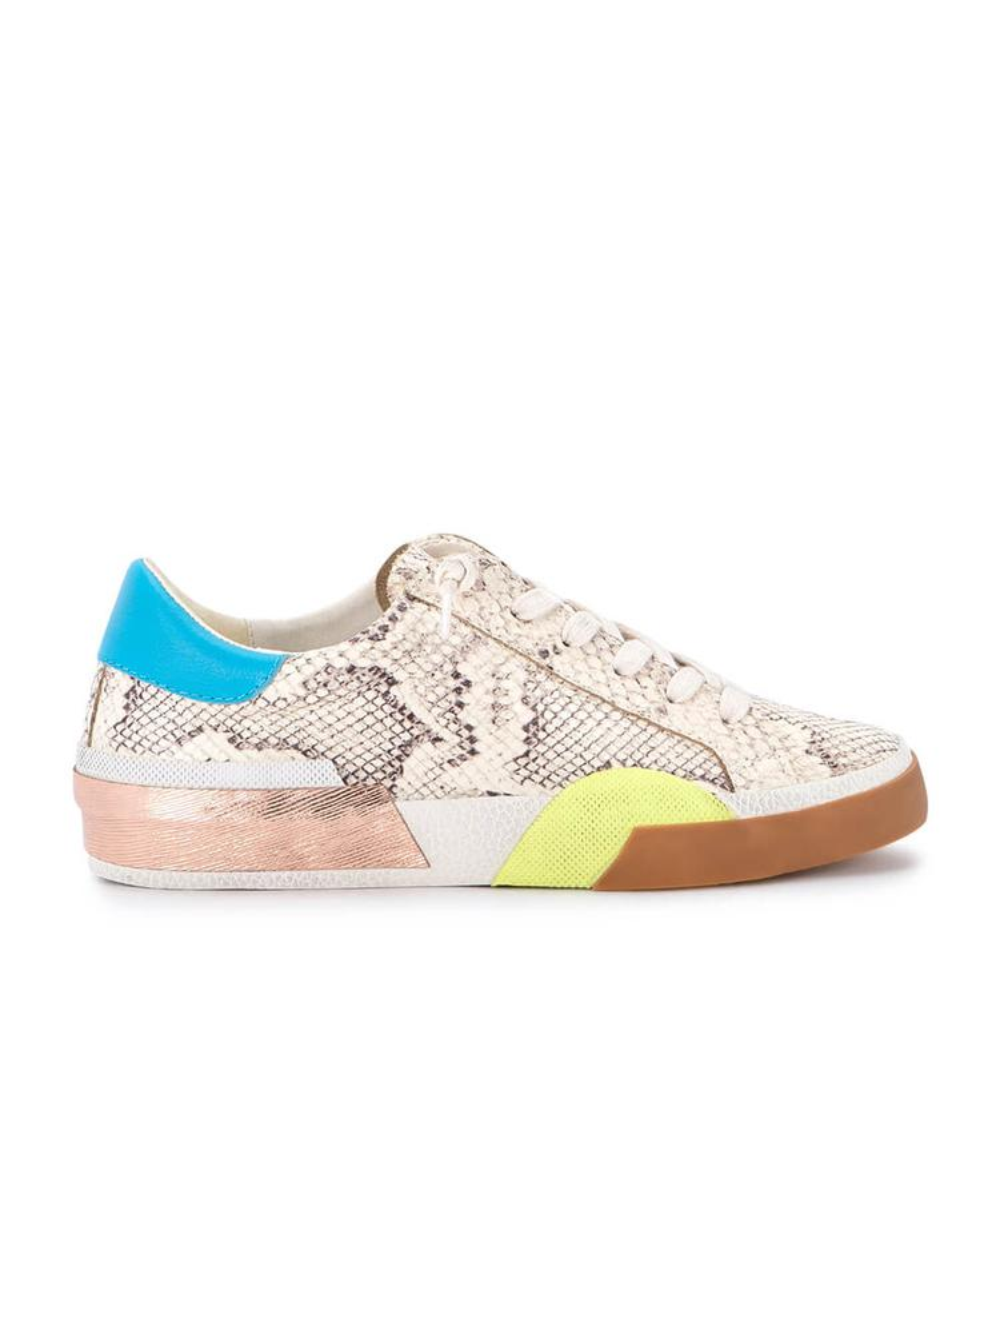 Zina Snake Print Sneaker Item # ZINA